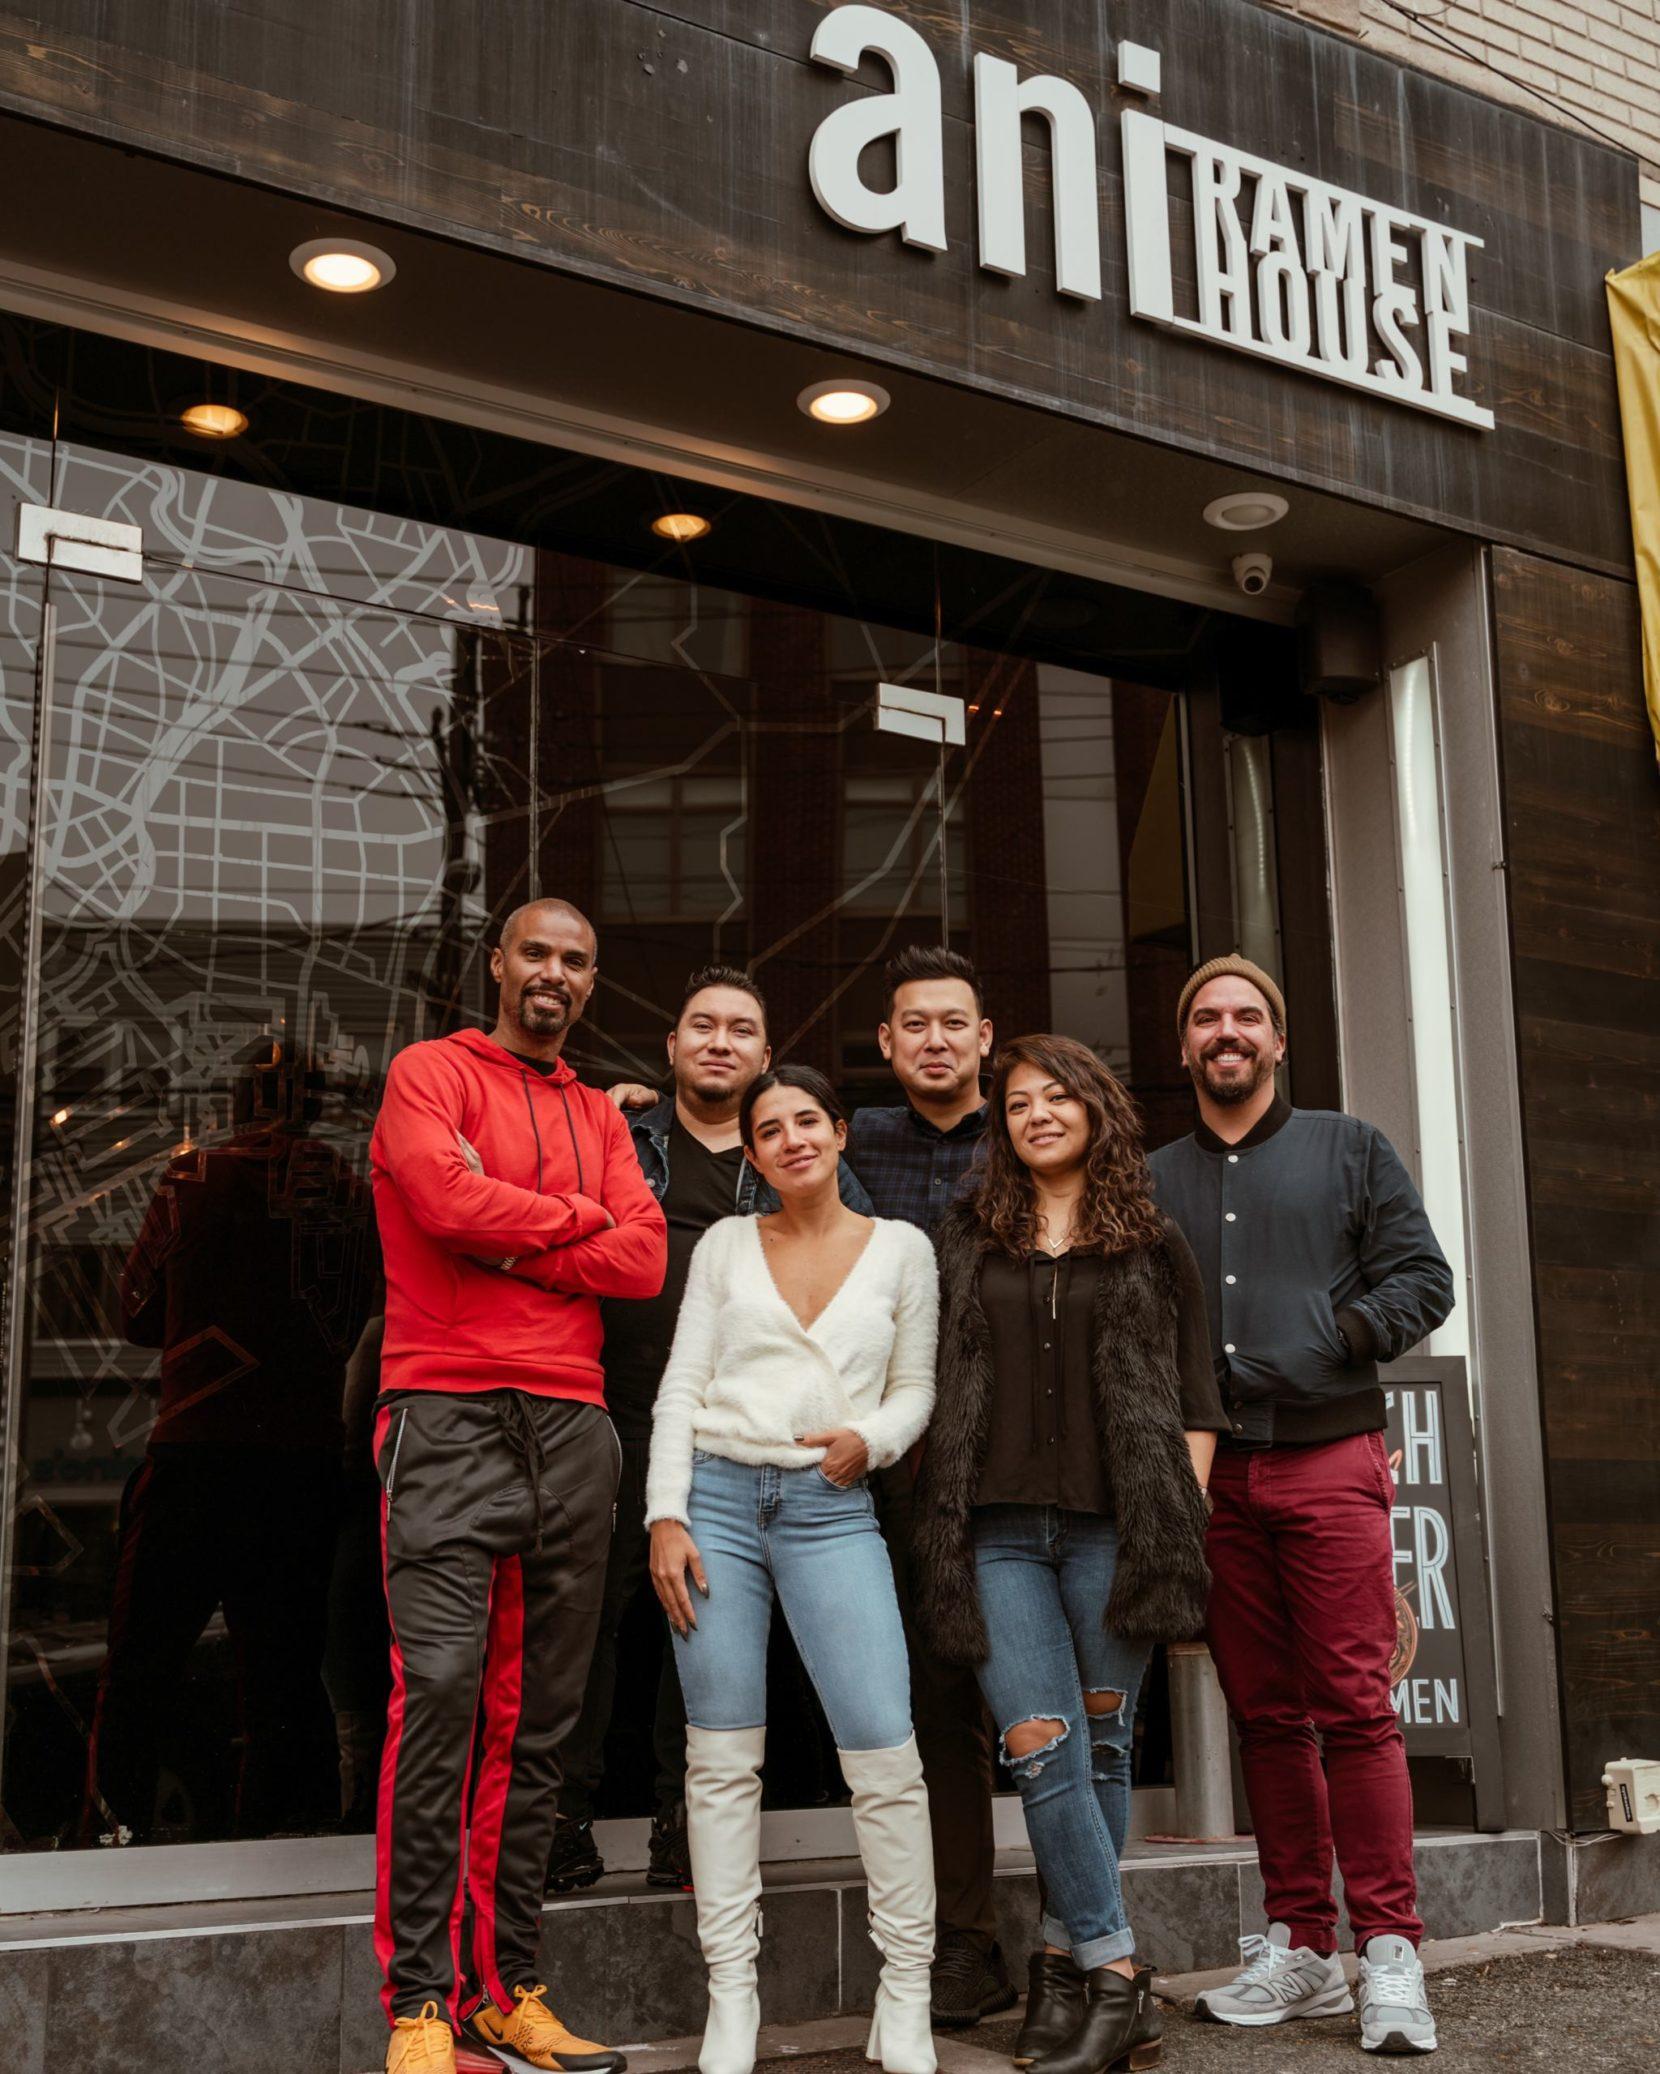 Ani Ramen Relaunching As Non-Profit Restaurant